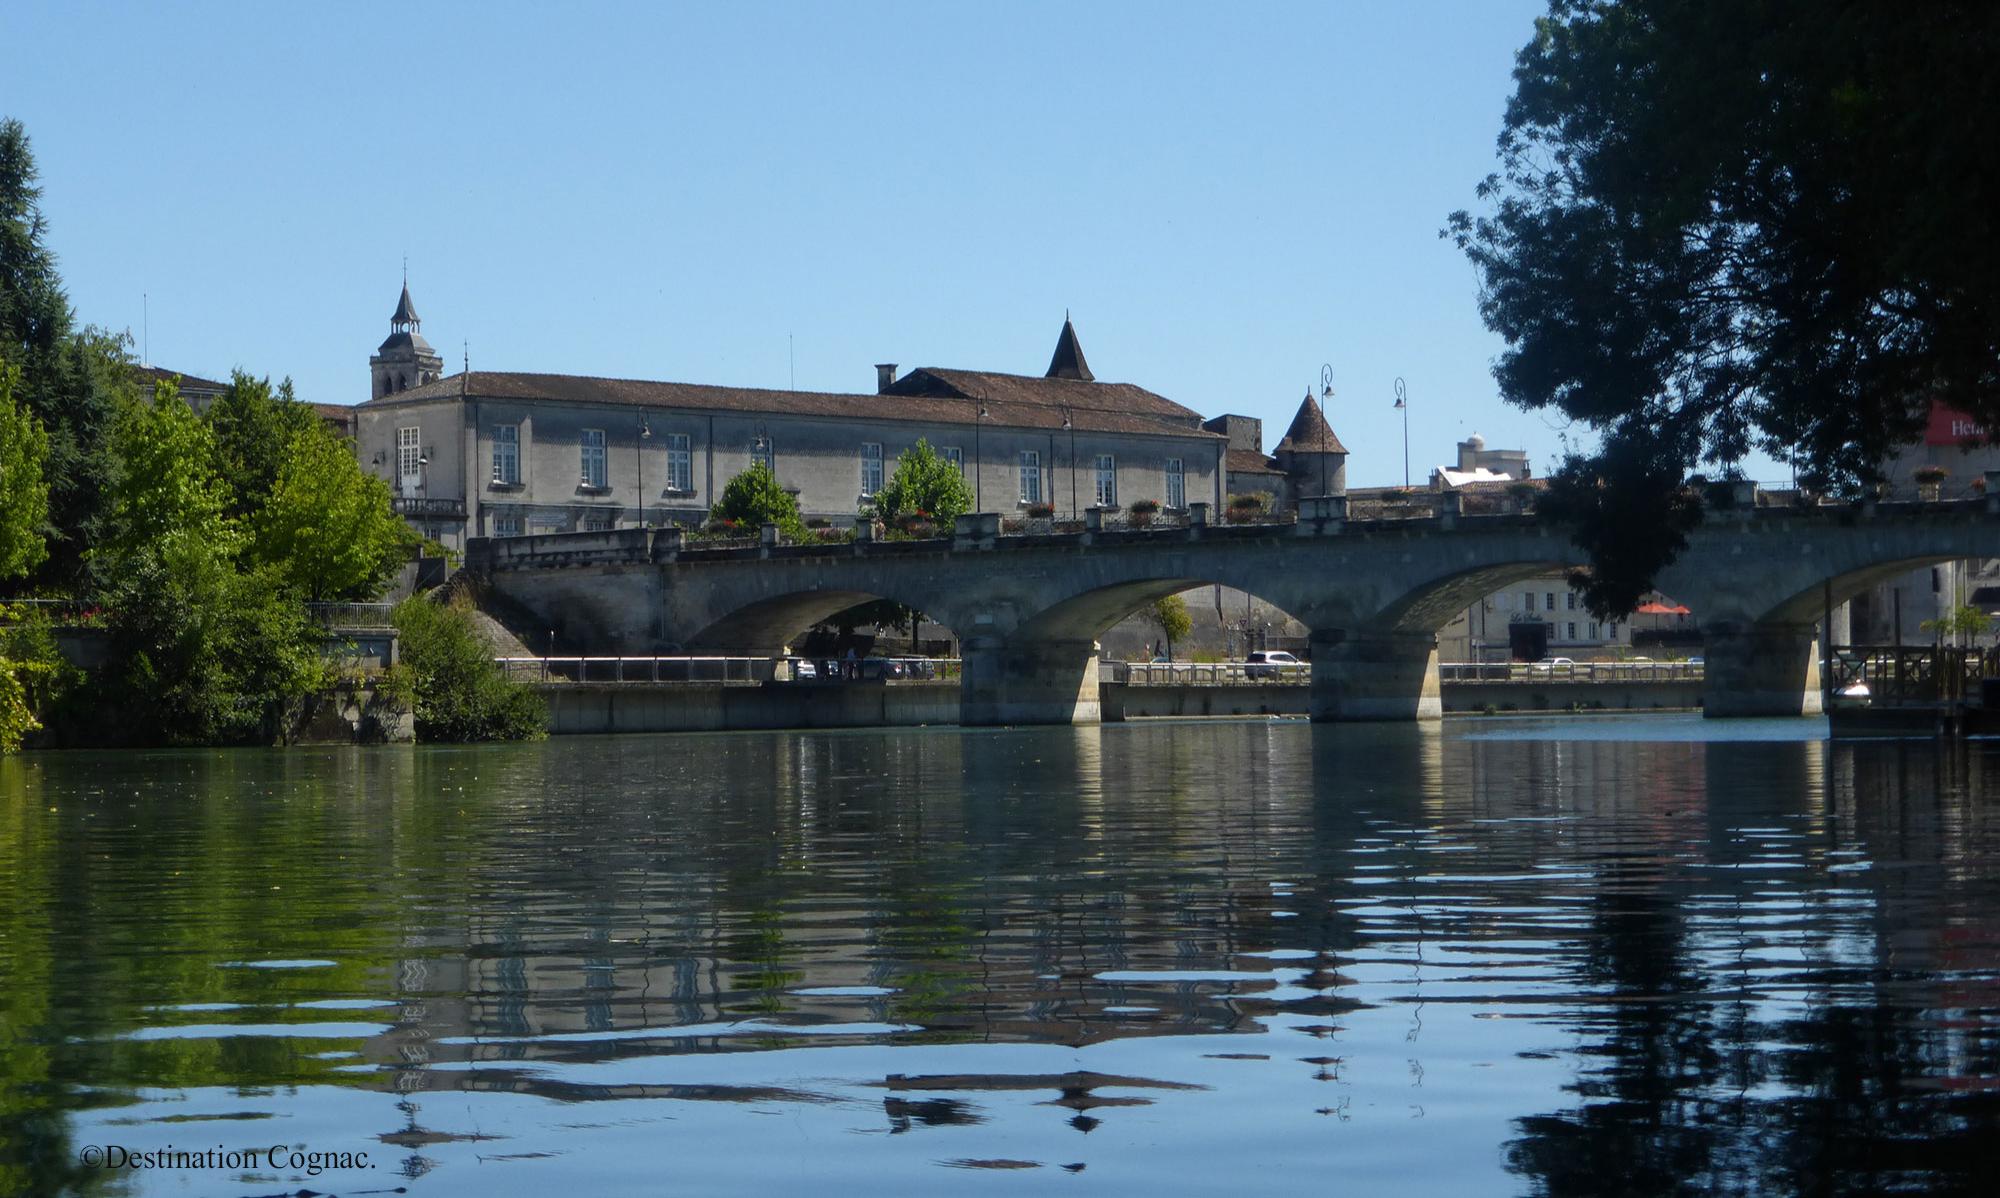 ville-de-cognac_edited